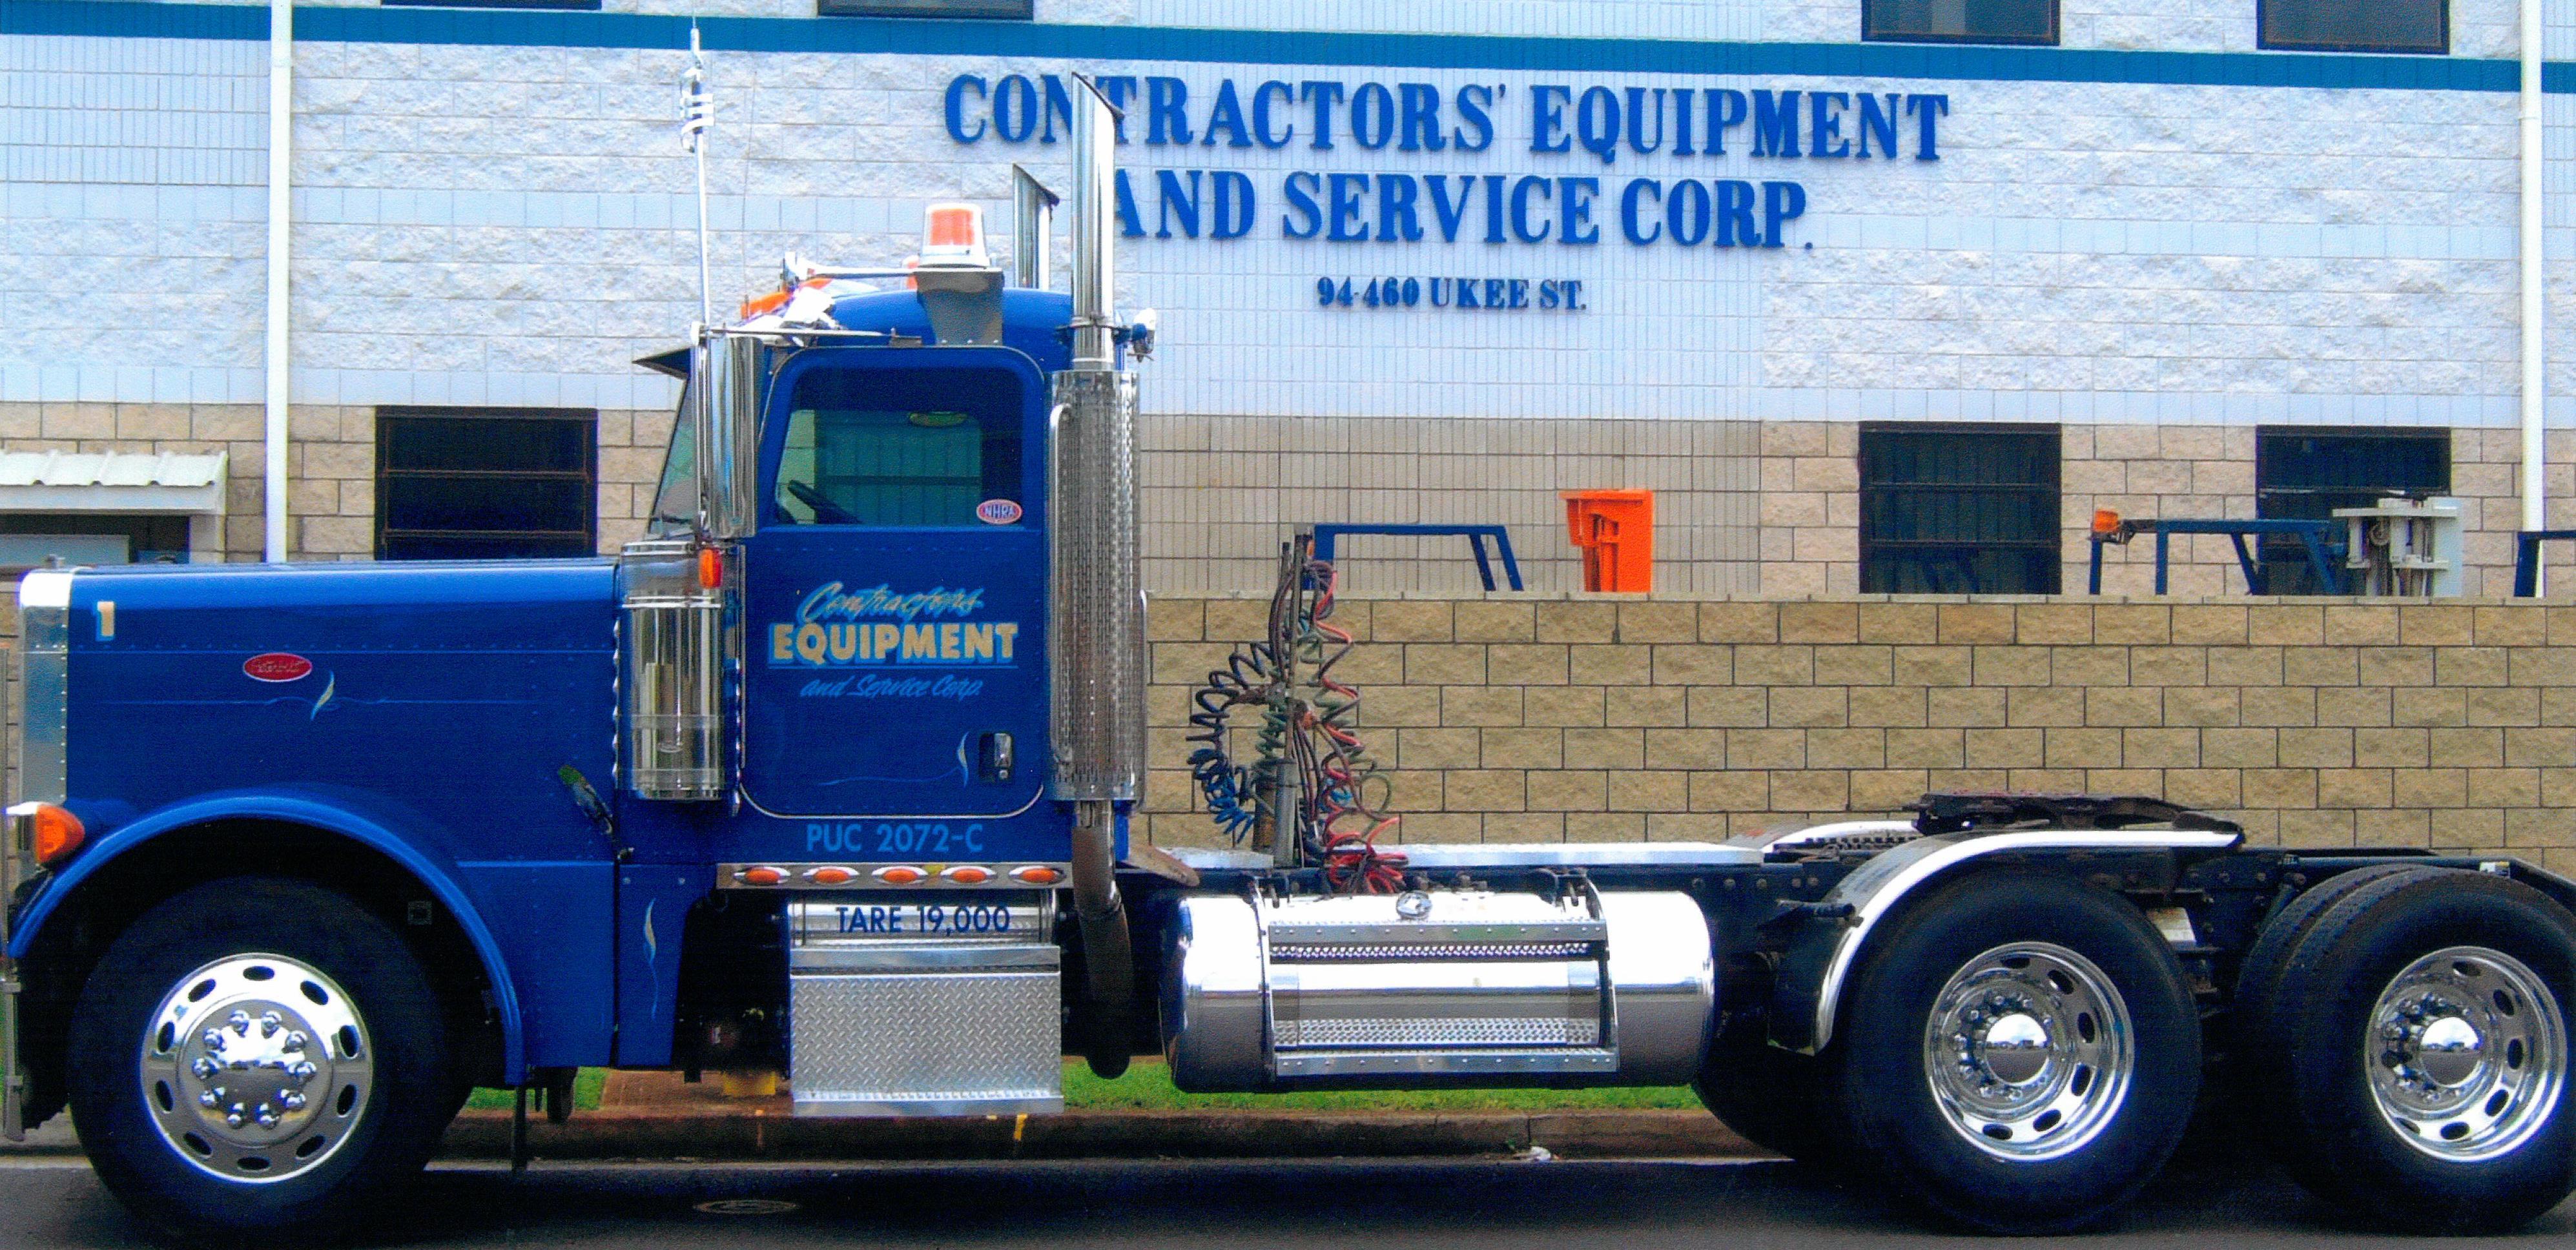 Semi trailer truck & heavy equipment rentals in Honolulu, HI